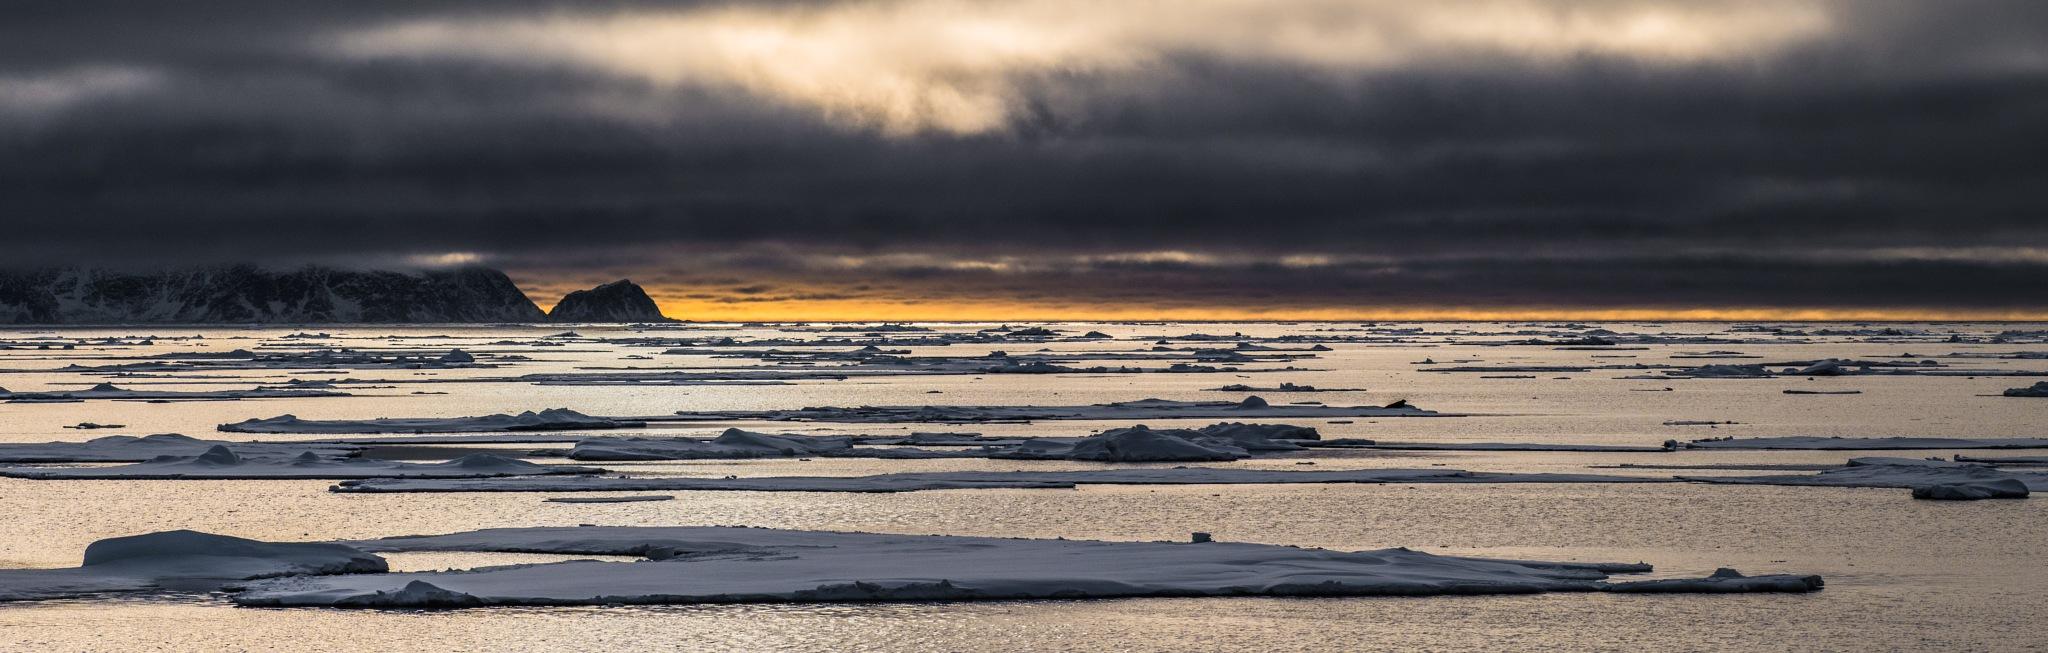 sunset, seven islands, svalbard by hutchst